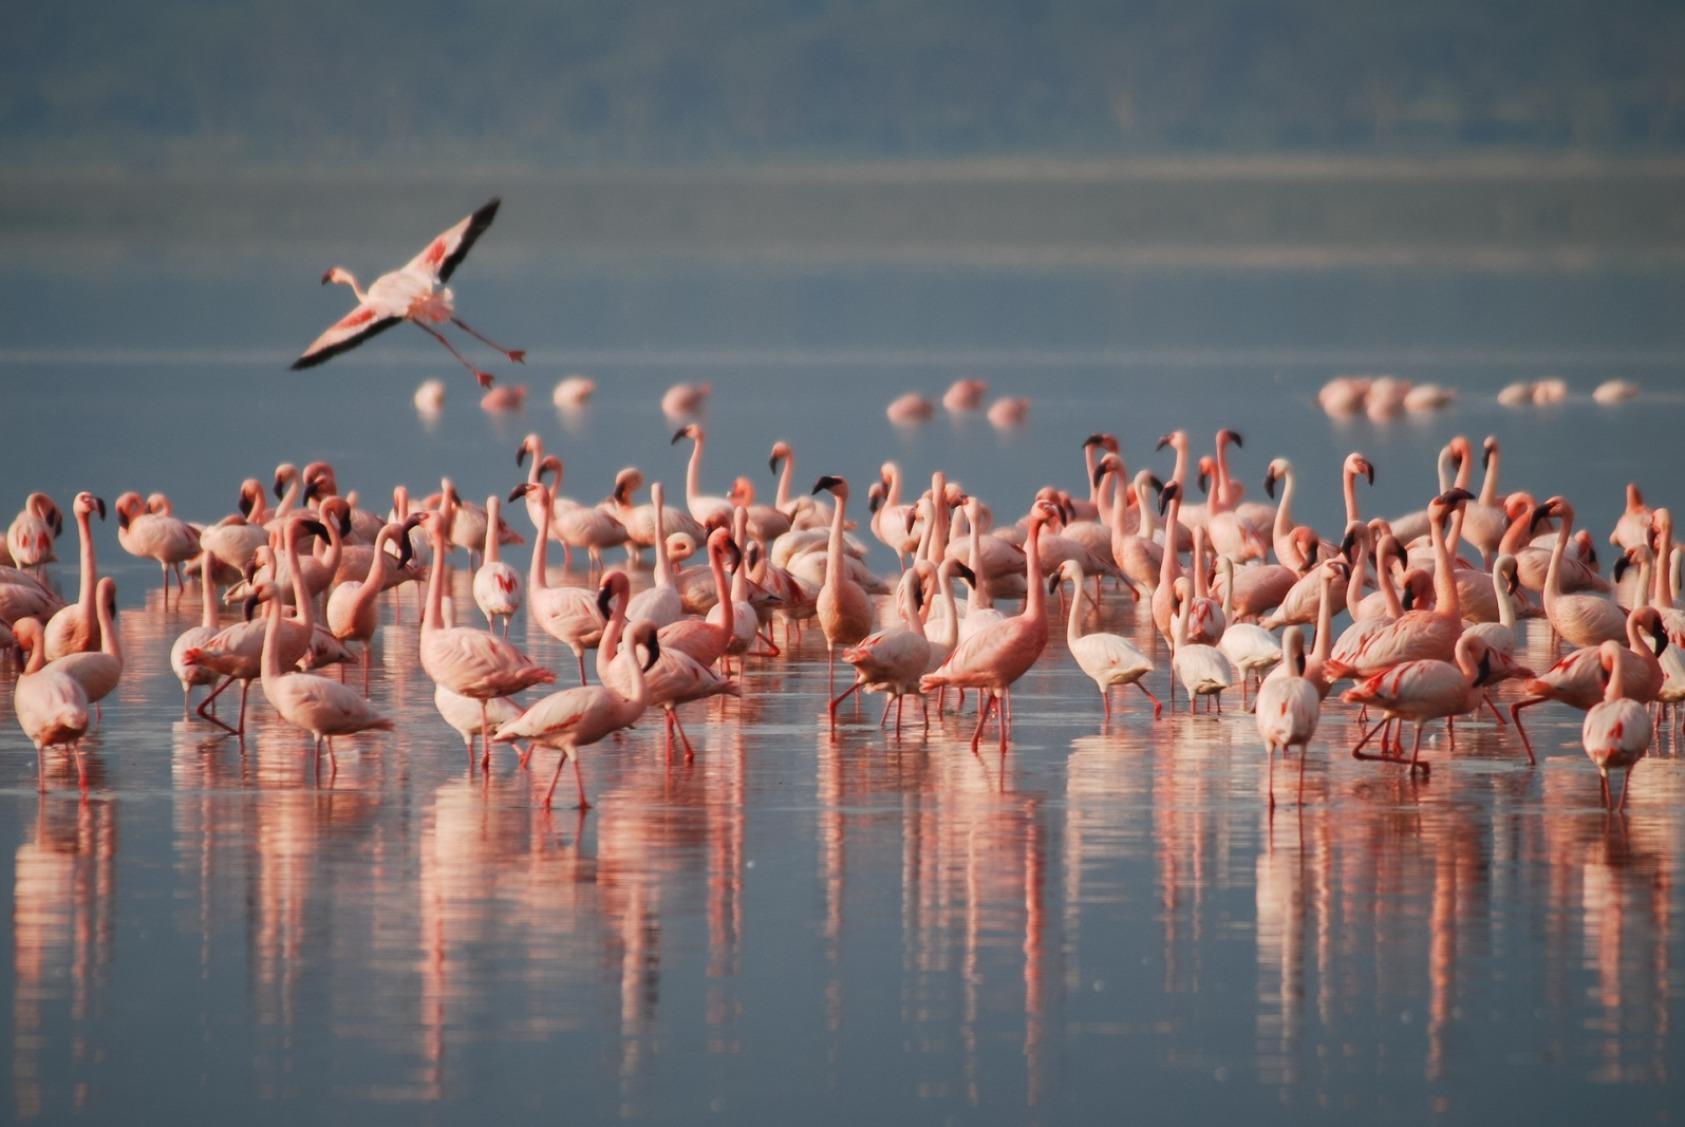 Flamingos on a lake - Original image